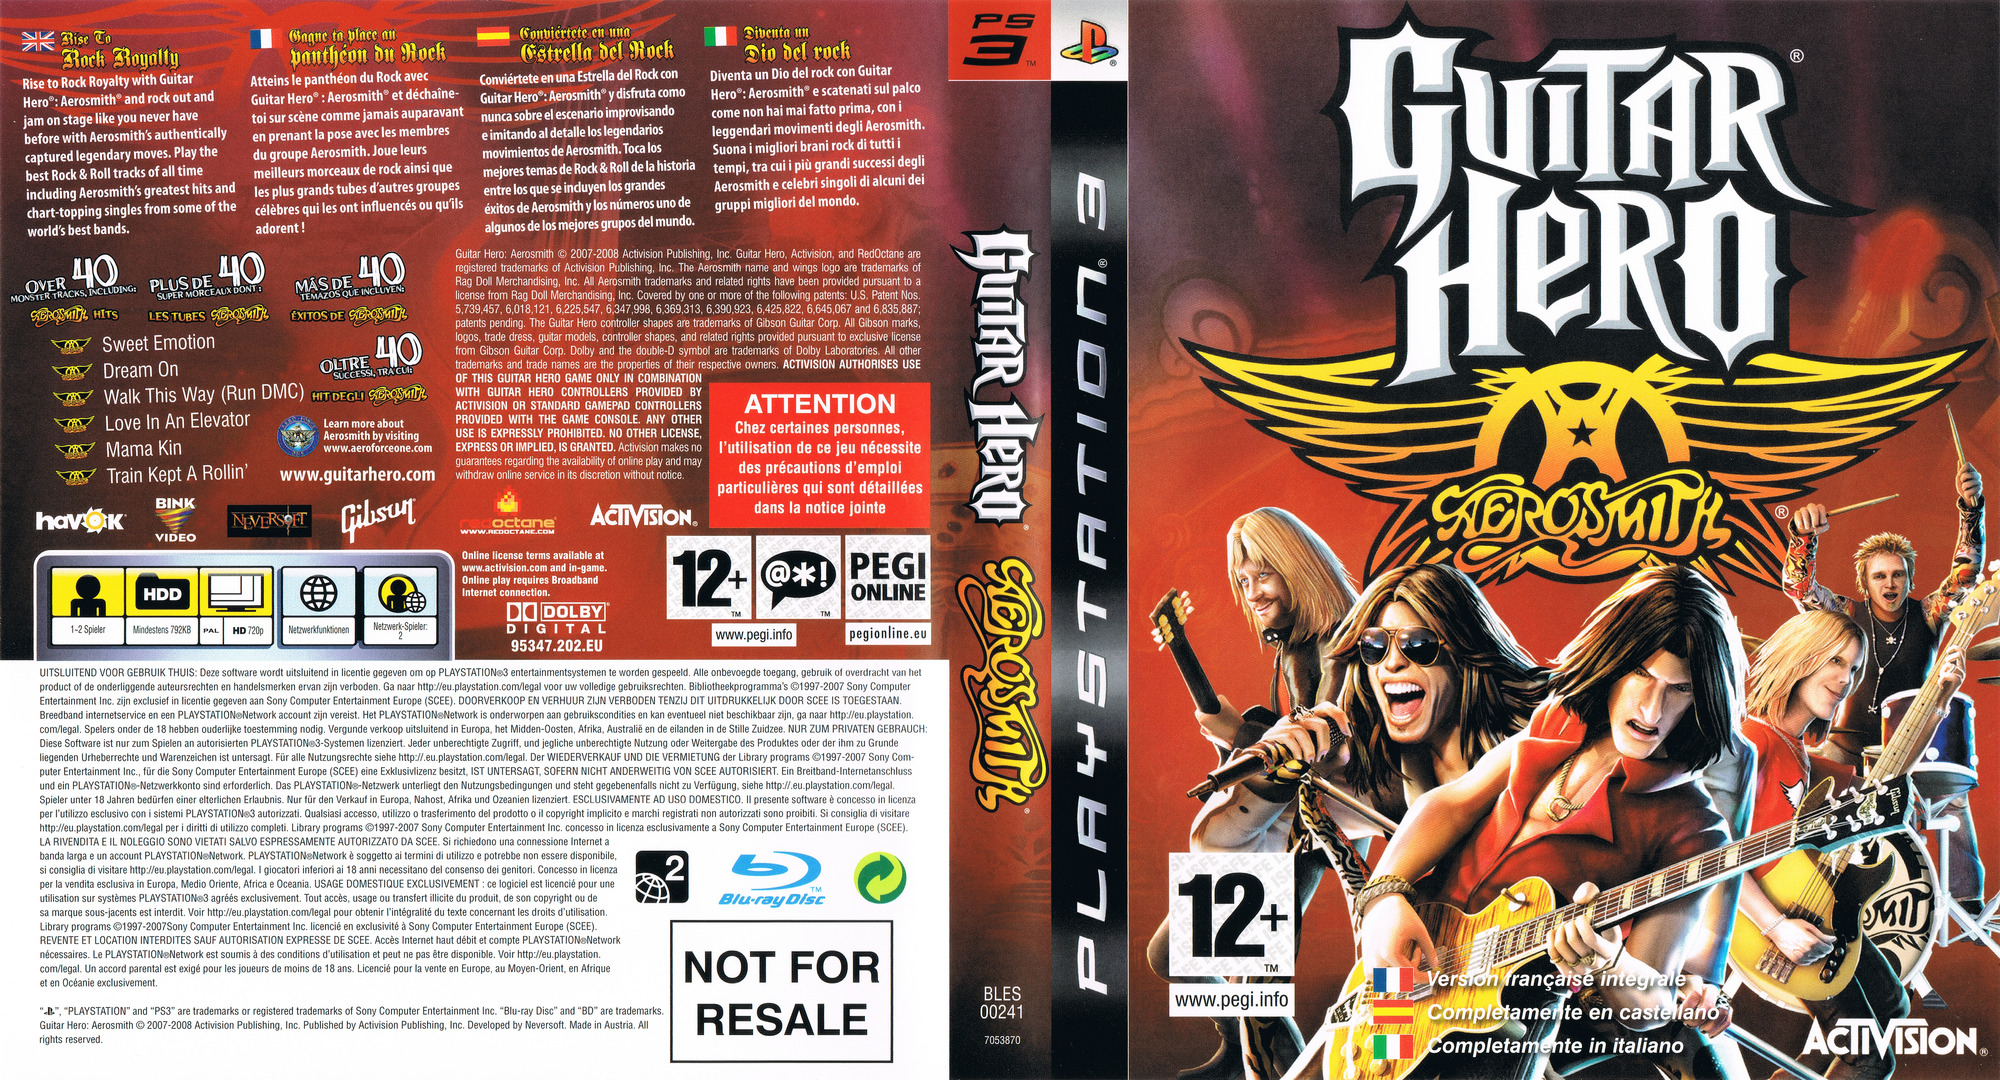 Guitar Hero: Aerosmith PS3 coverfullHQ (BLES00241)